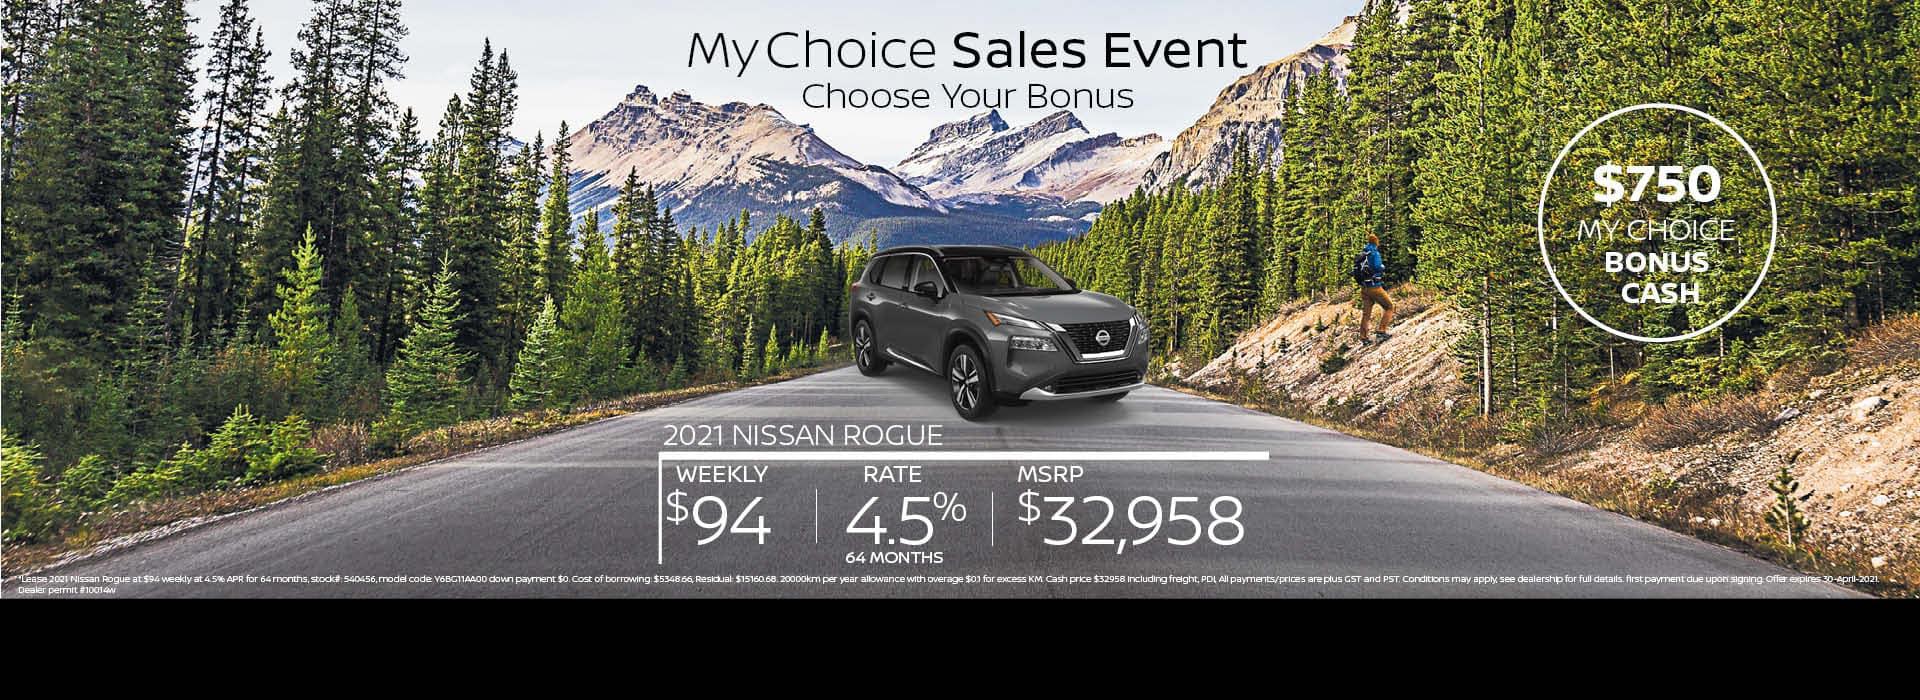 2021_Nissan_Rogue_Desktop_April2021